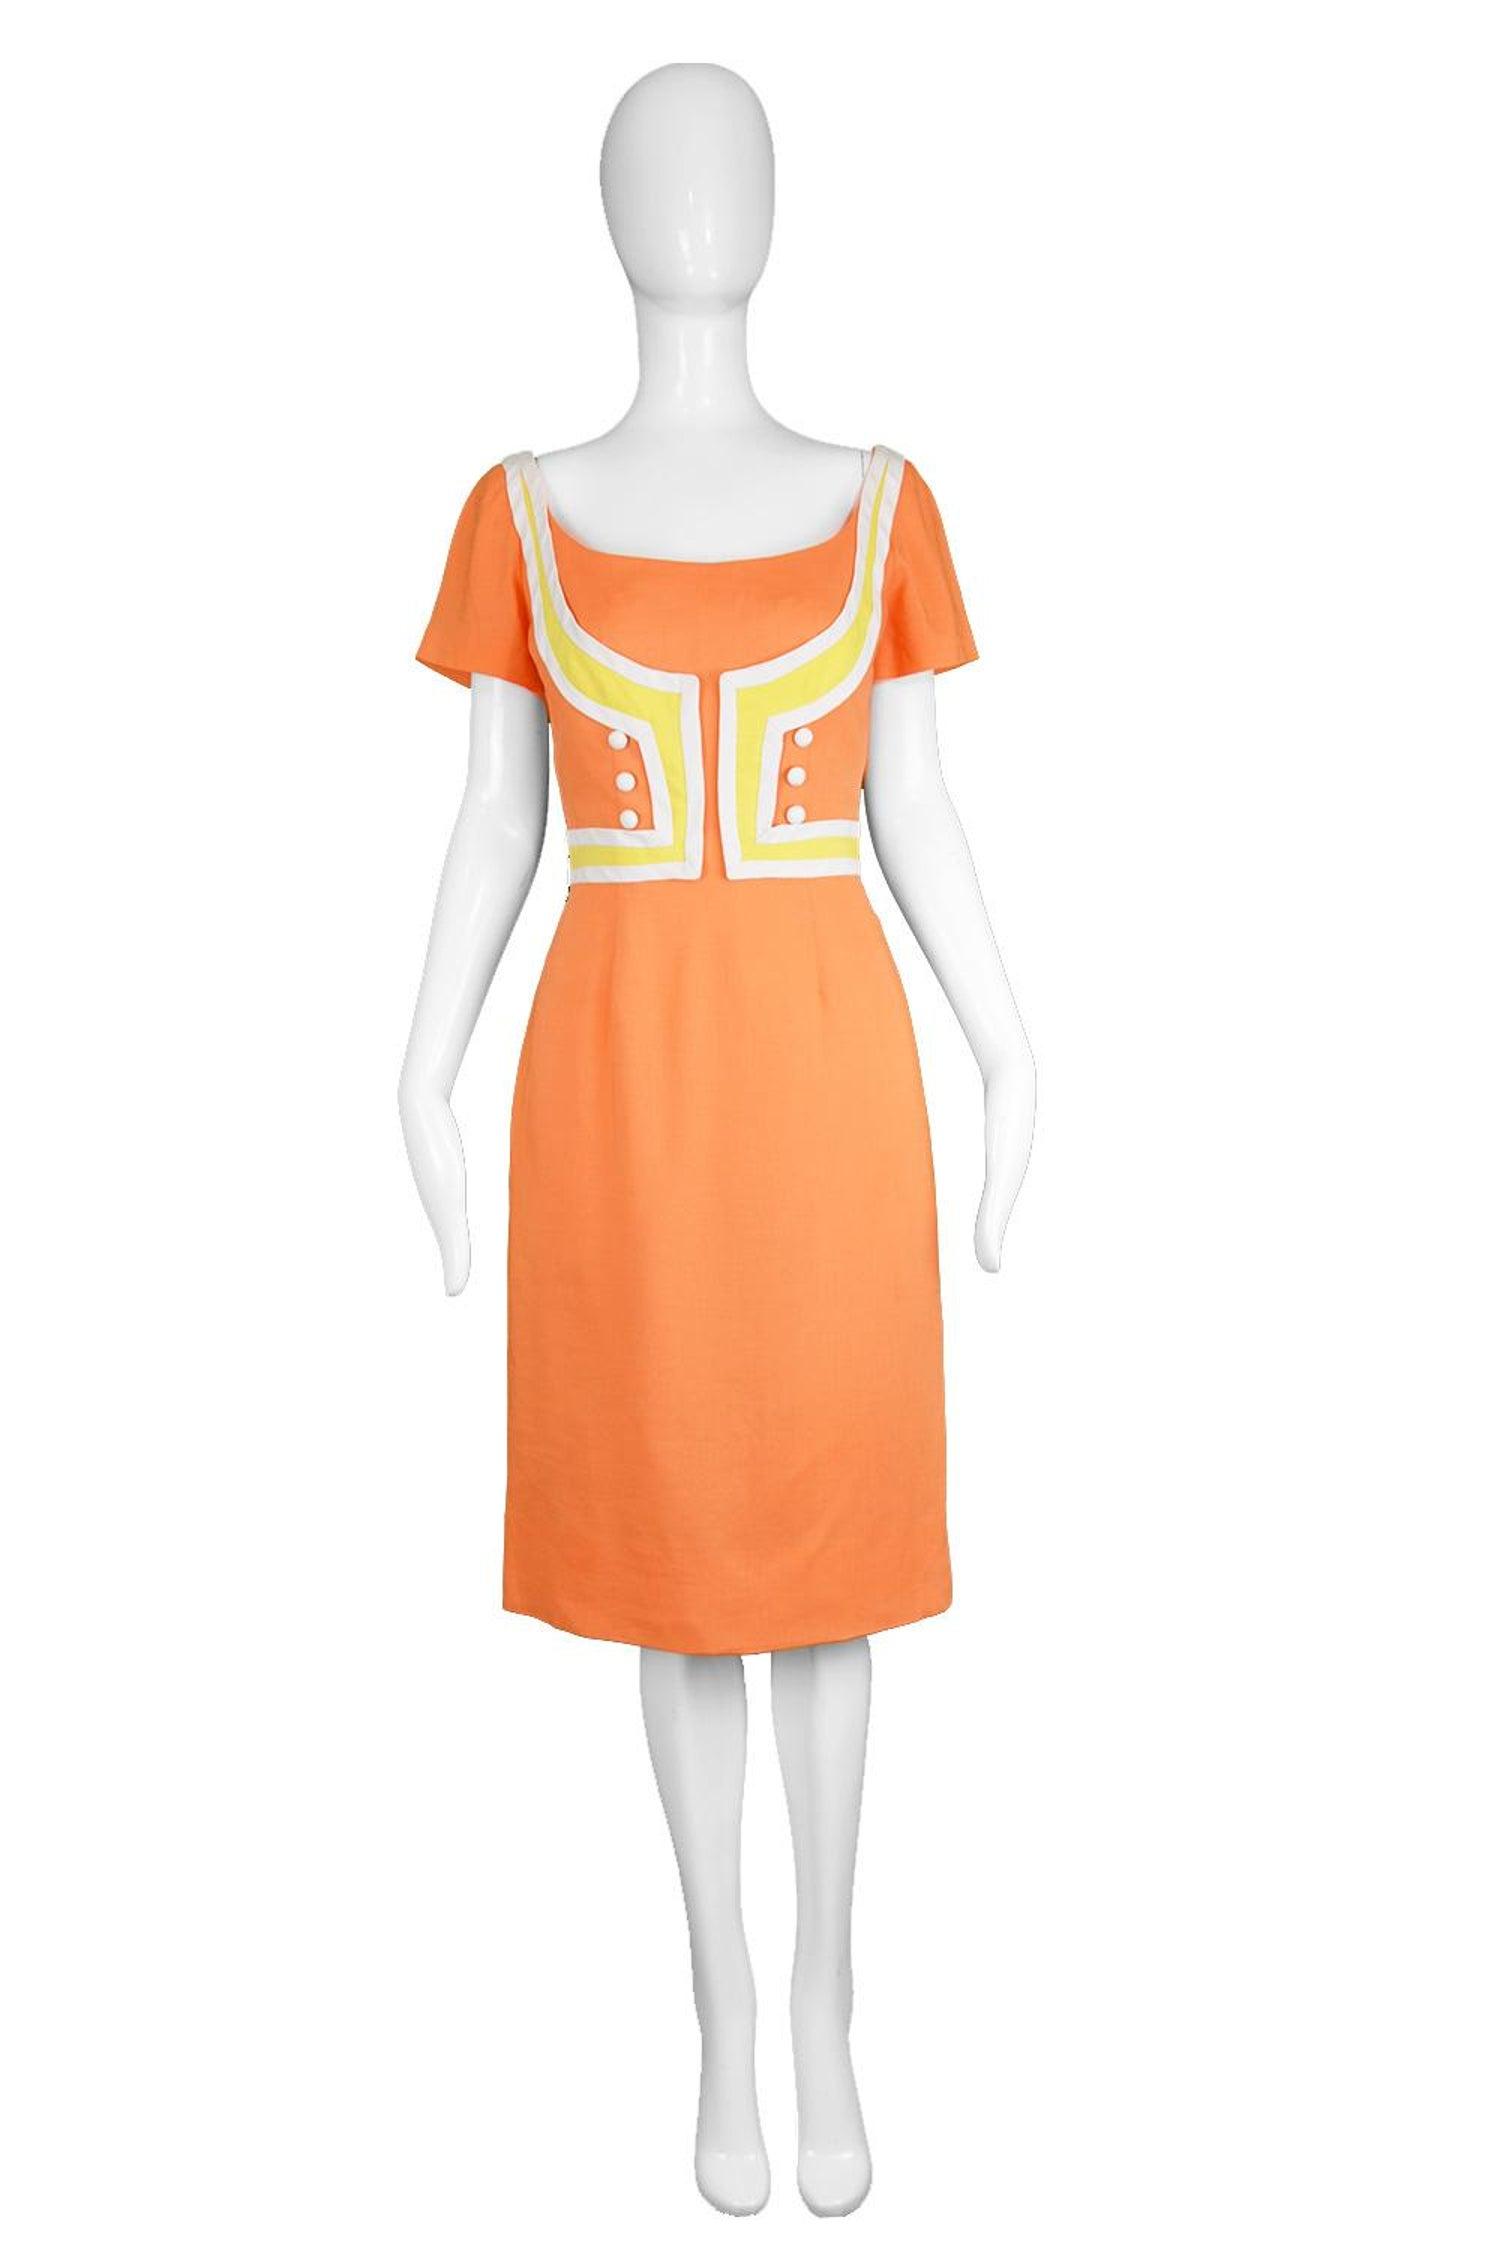 320bb8af04a3 Oleg Cassini Vintage Orange, White and Yellow Linen Short Sleeve Mod Dress,  1960s For Sale at 1stdibs